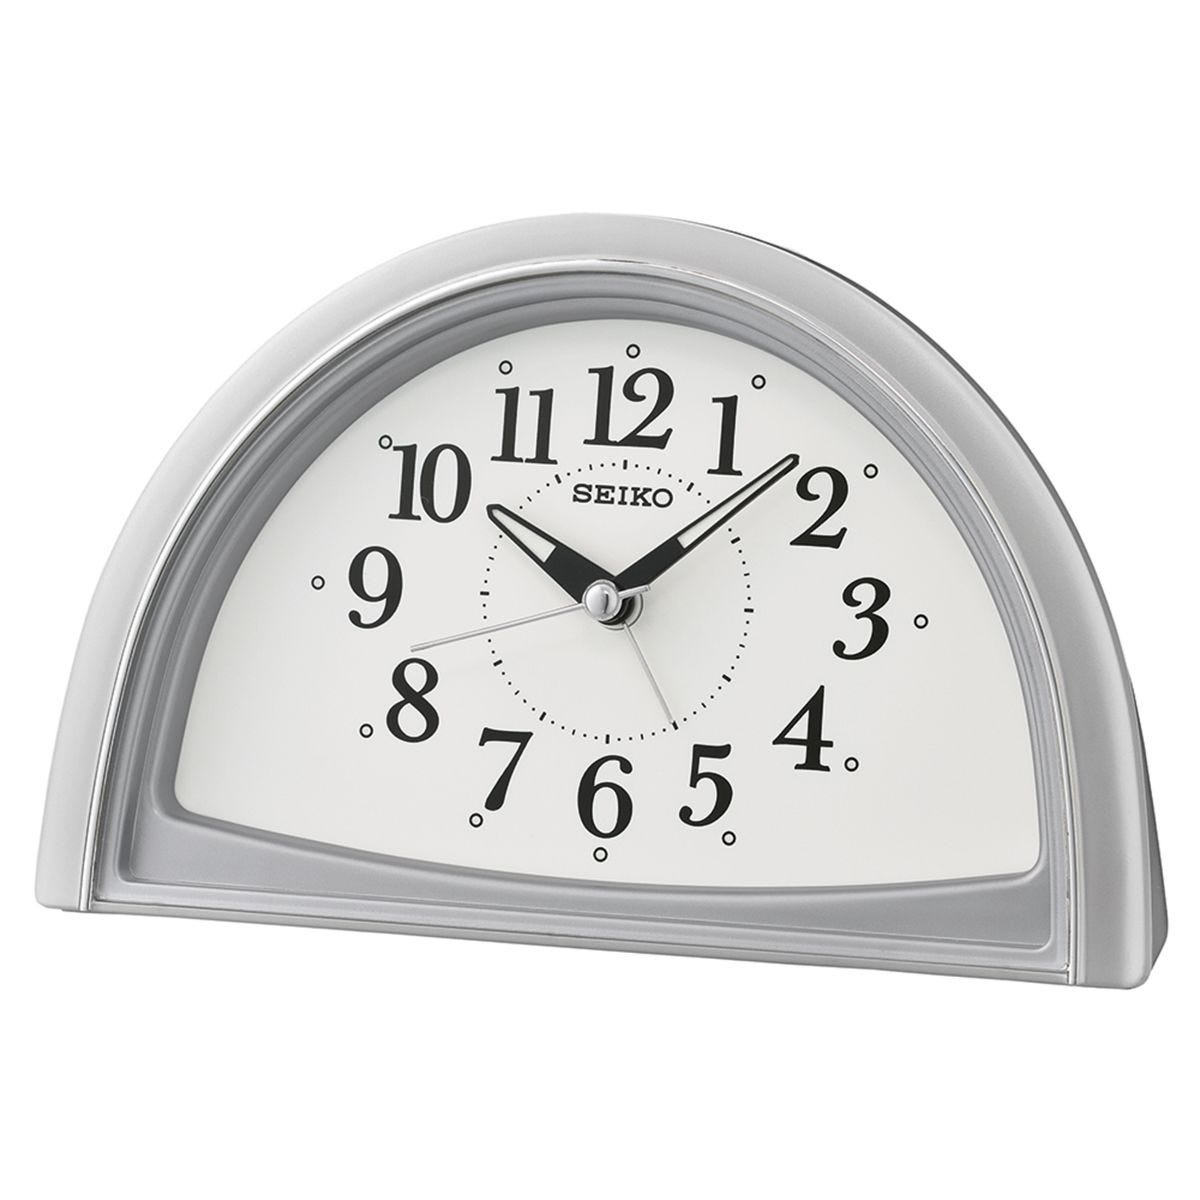 Seiko Analogue Beep Alarm Clock - Silver